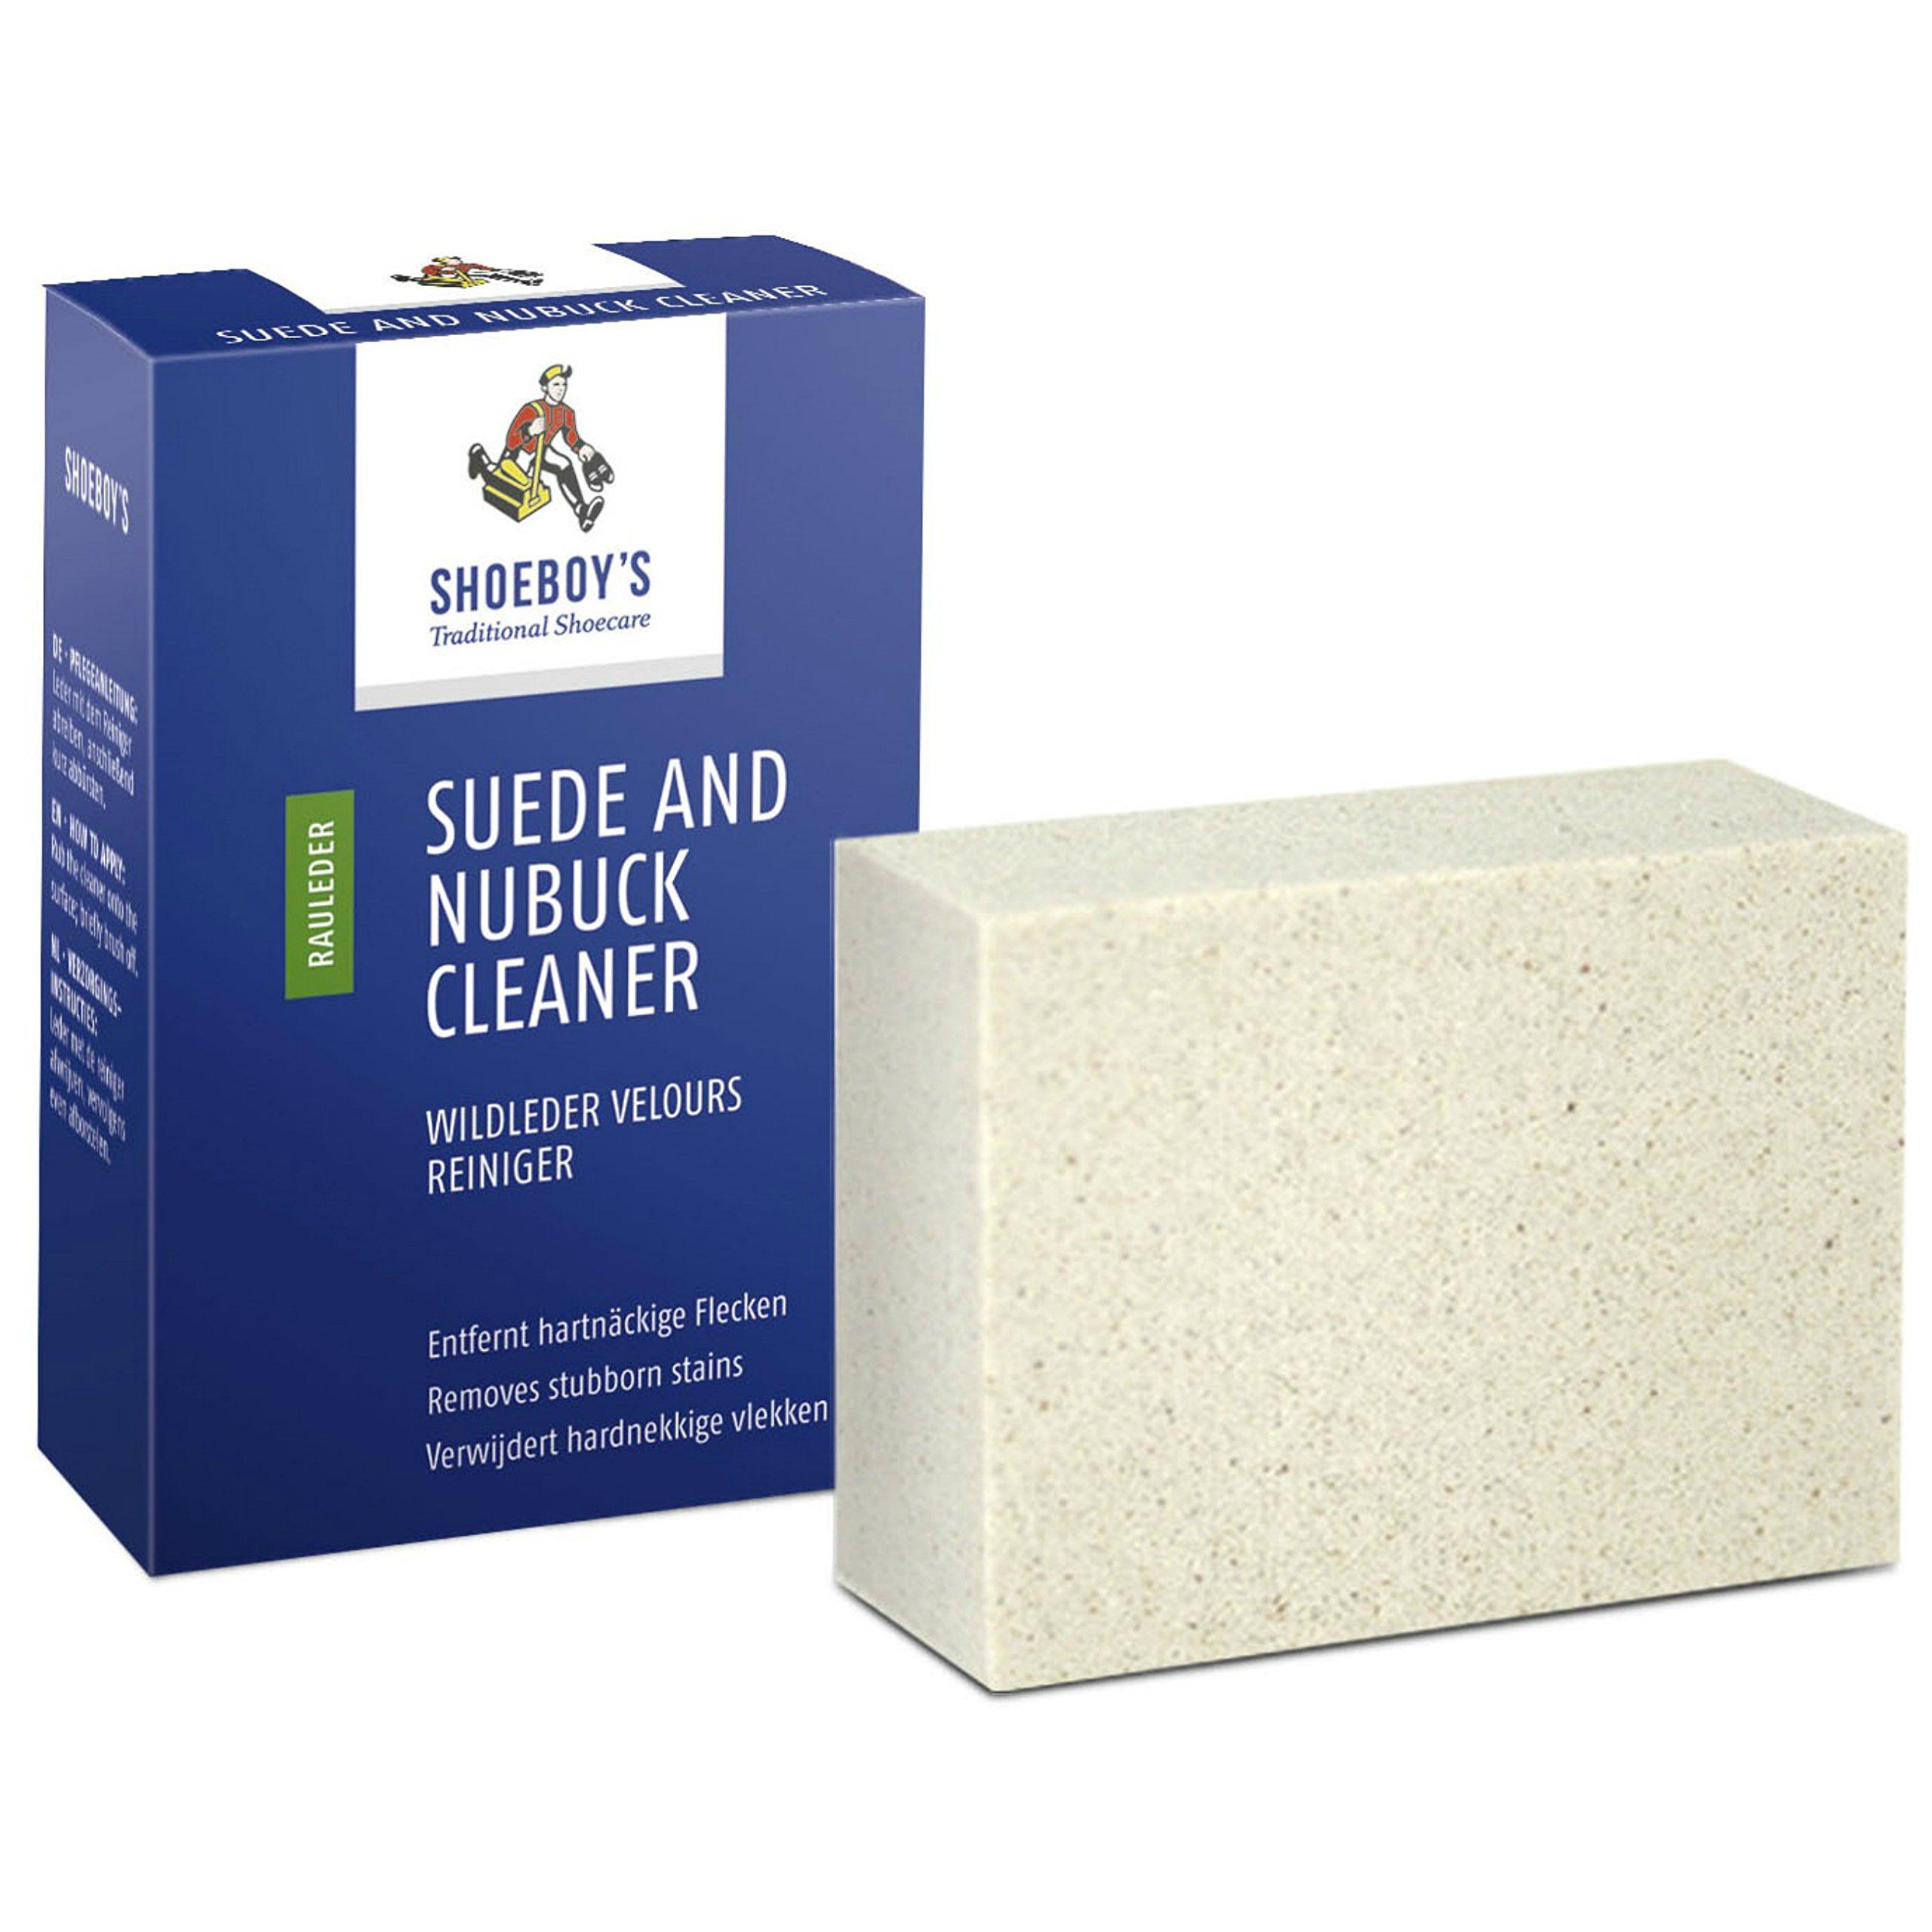 Shoeboy's Suede and Nubuck Care Eraser/Cleaner / 2.2'' X 1.5''